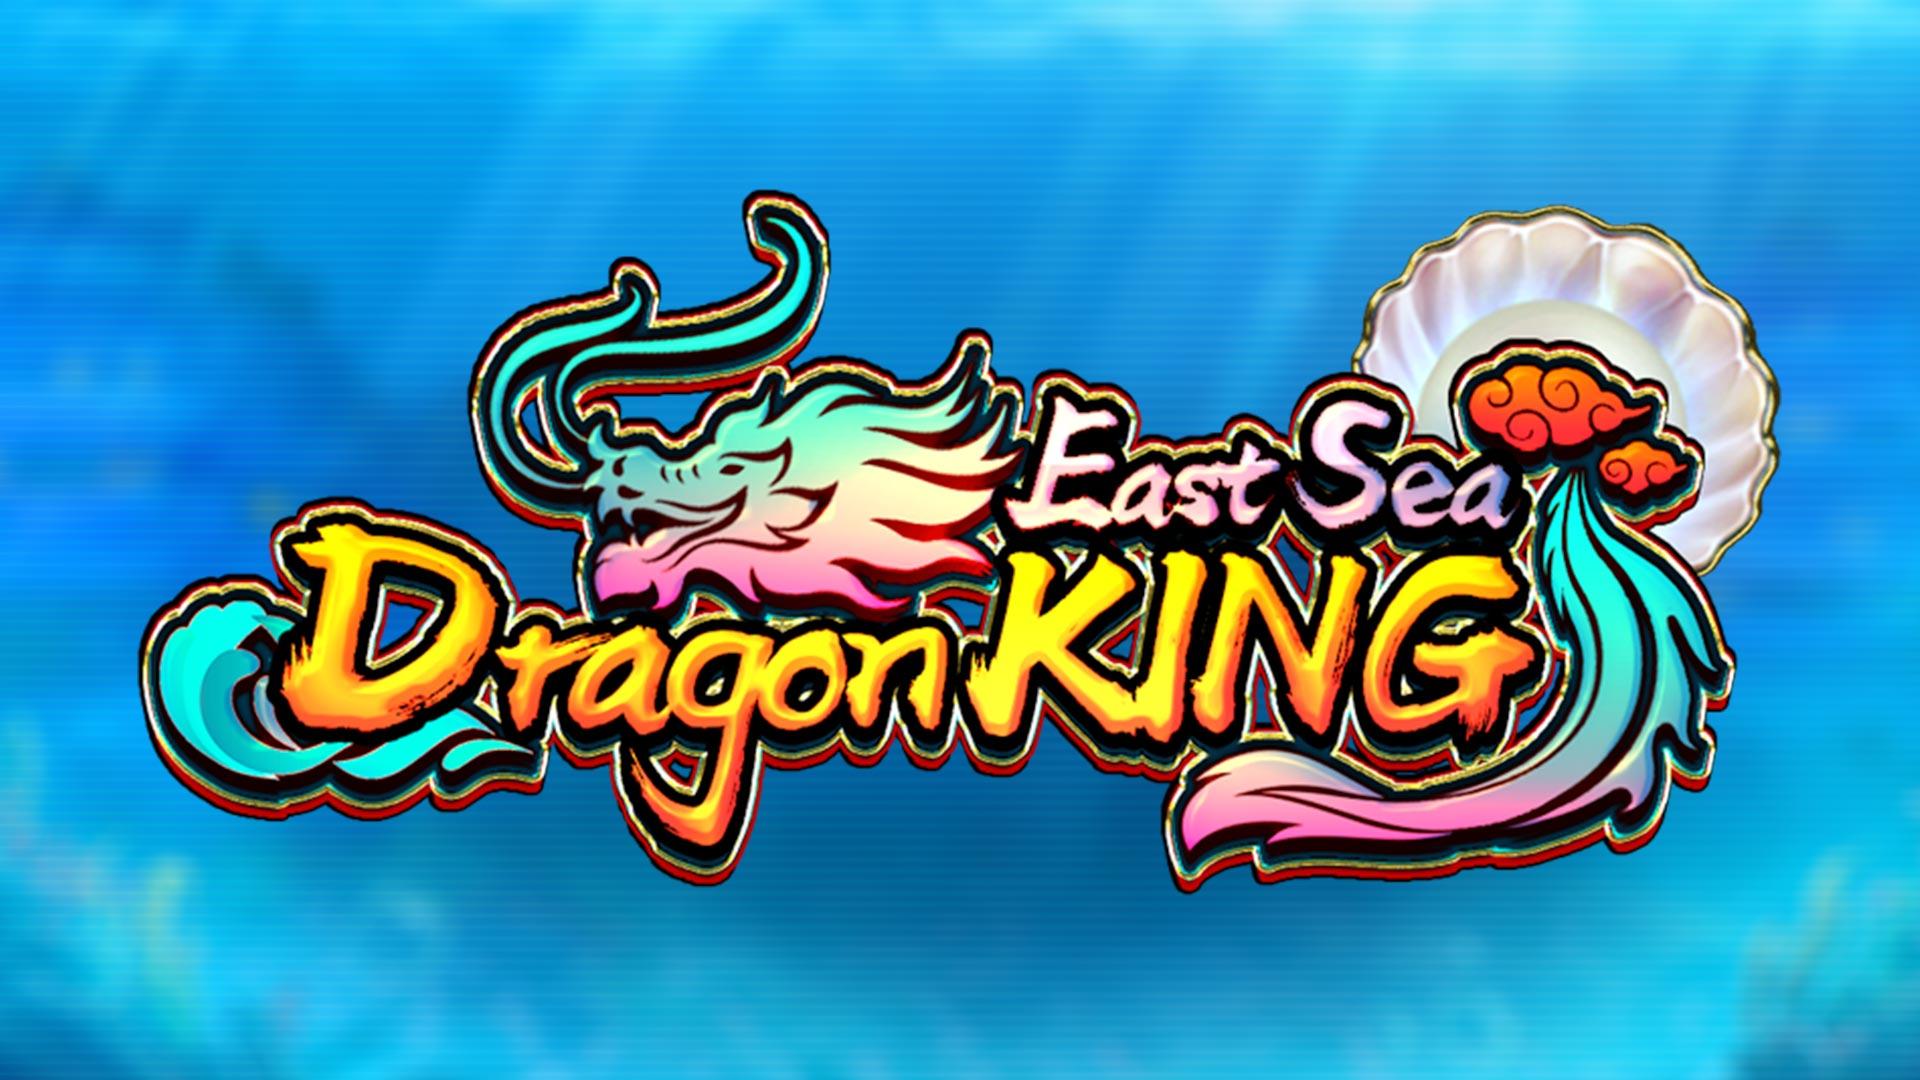 East Sea Dragon King Logo